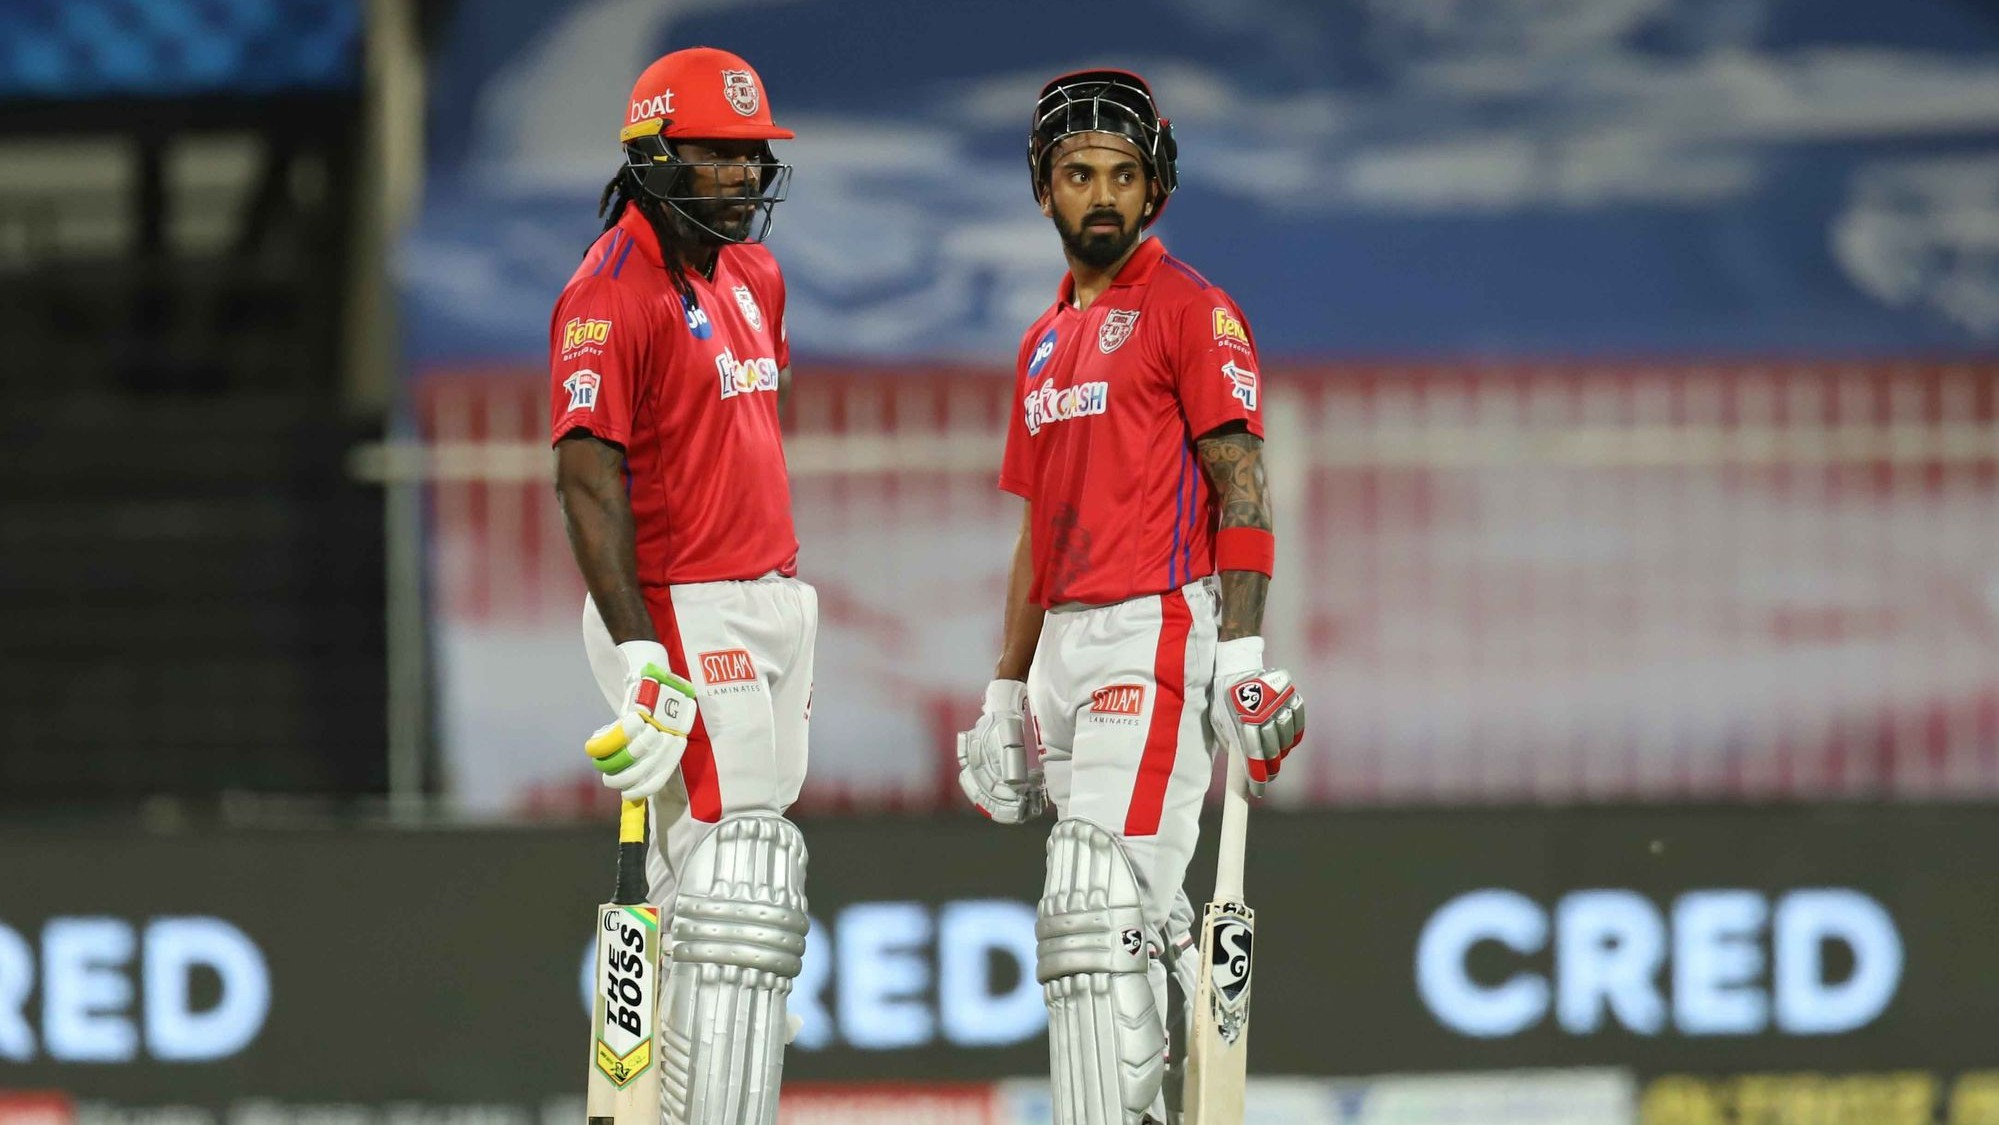 IPL 2020: Match 31, RCB v KXIP - Statistical Highlights of the Match